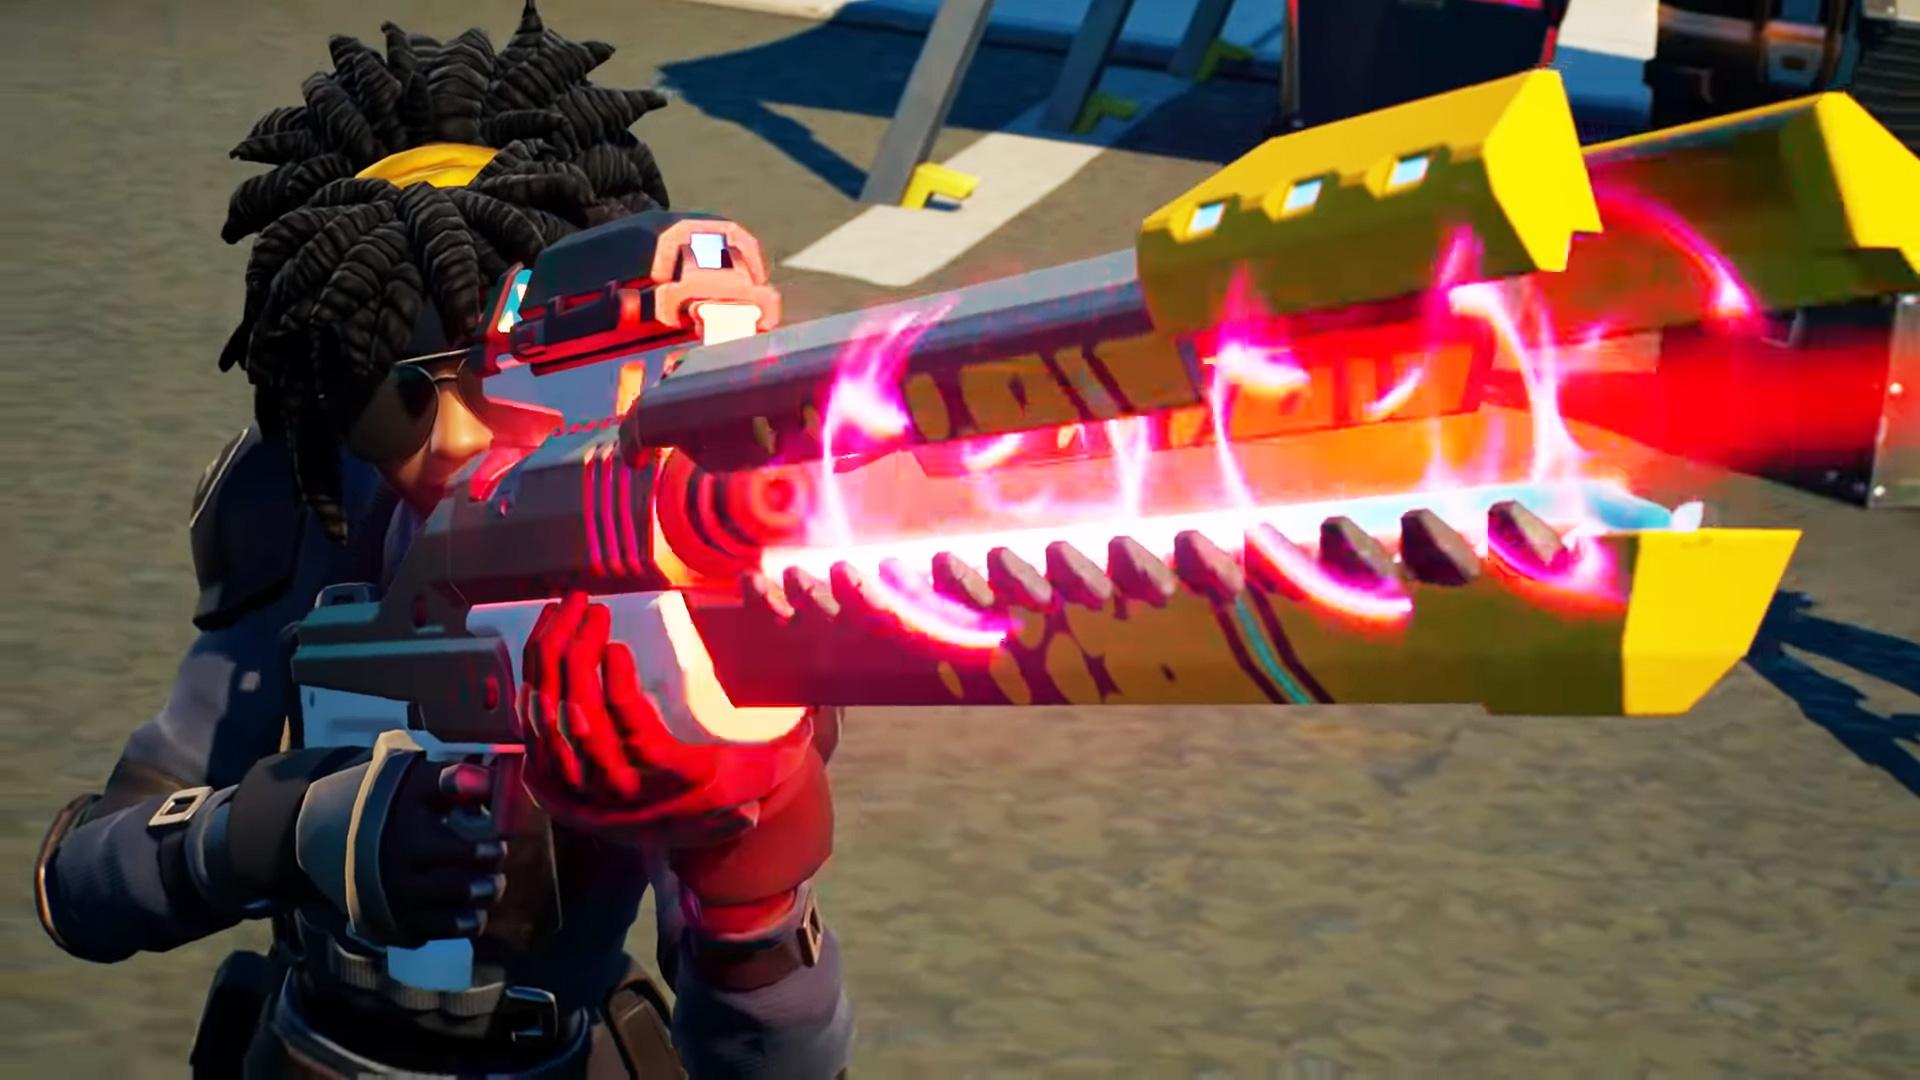 Weapons Back In Fortnite Fortnite New Guns Here Are All The New Weapons In Fortnite Season 7 Pcgamesn